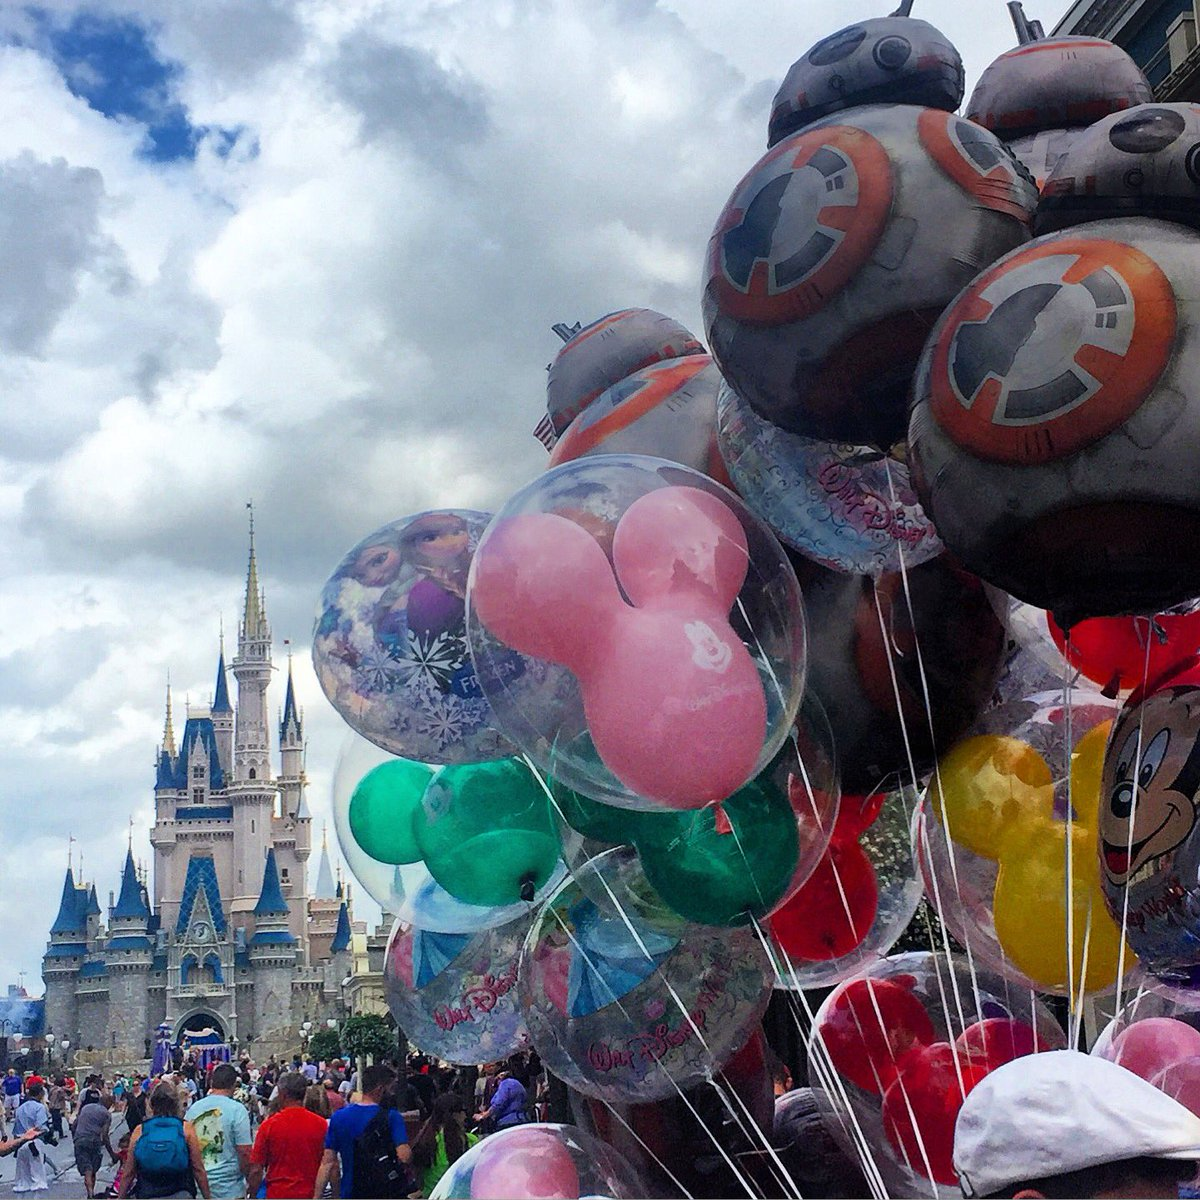 Disney's Magic Kingdom Theme Park, Disney balloons on Main Street USA